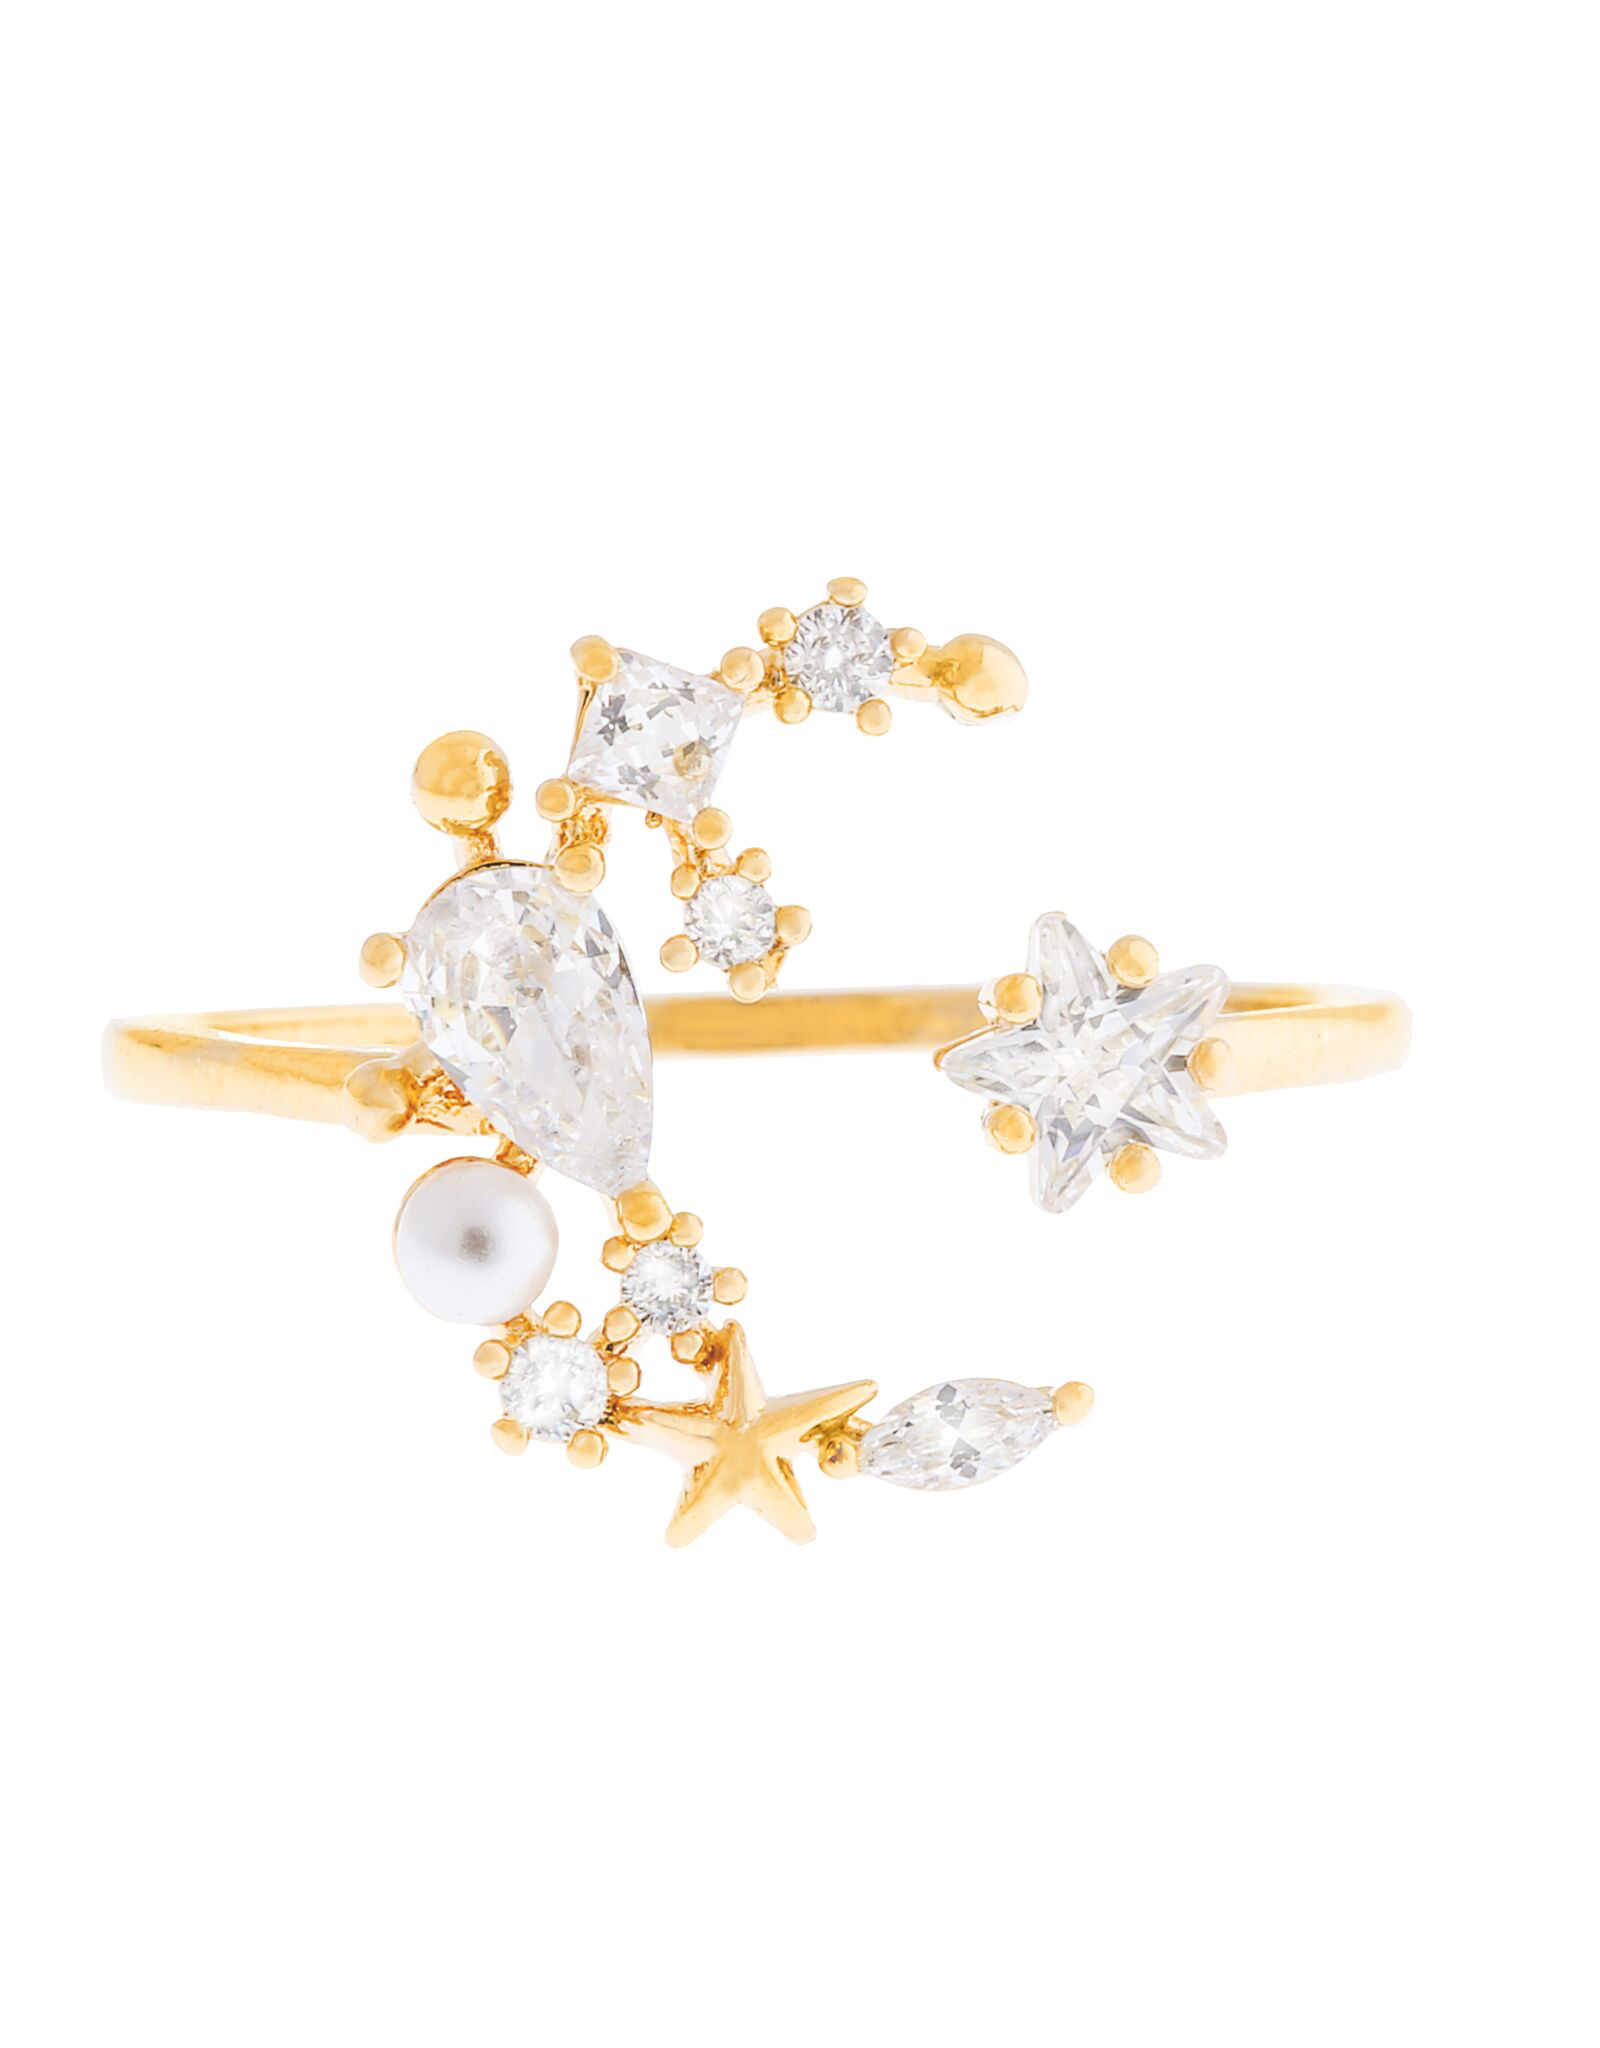 Girls Crew moonlight ring- gold